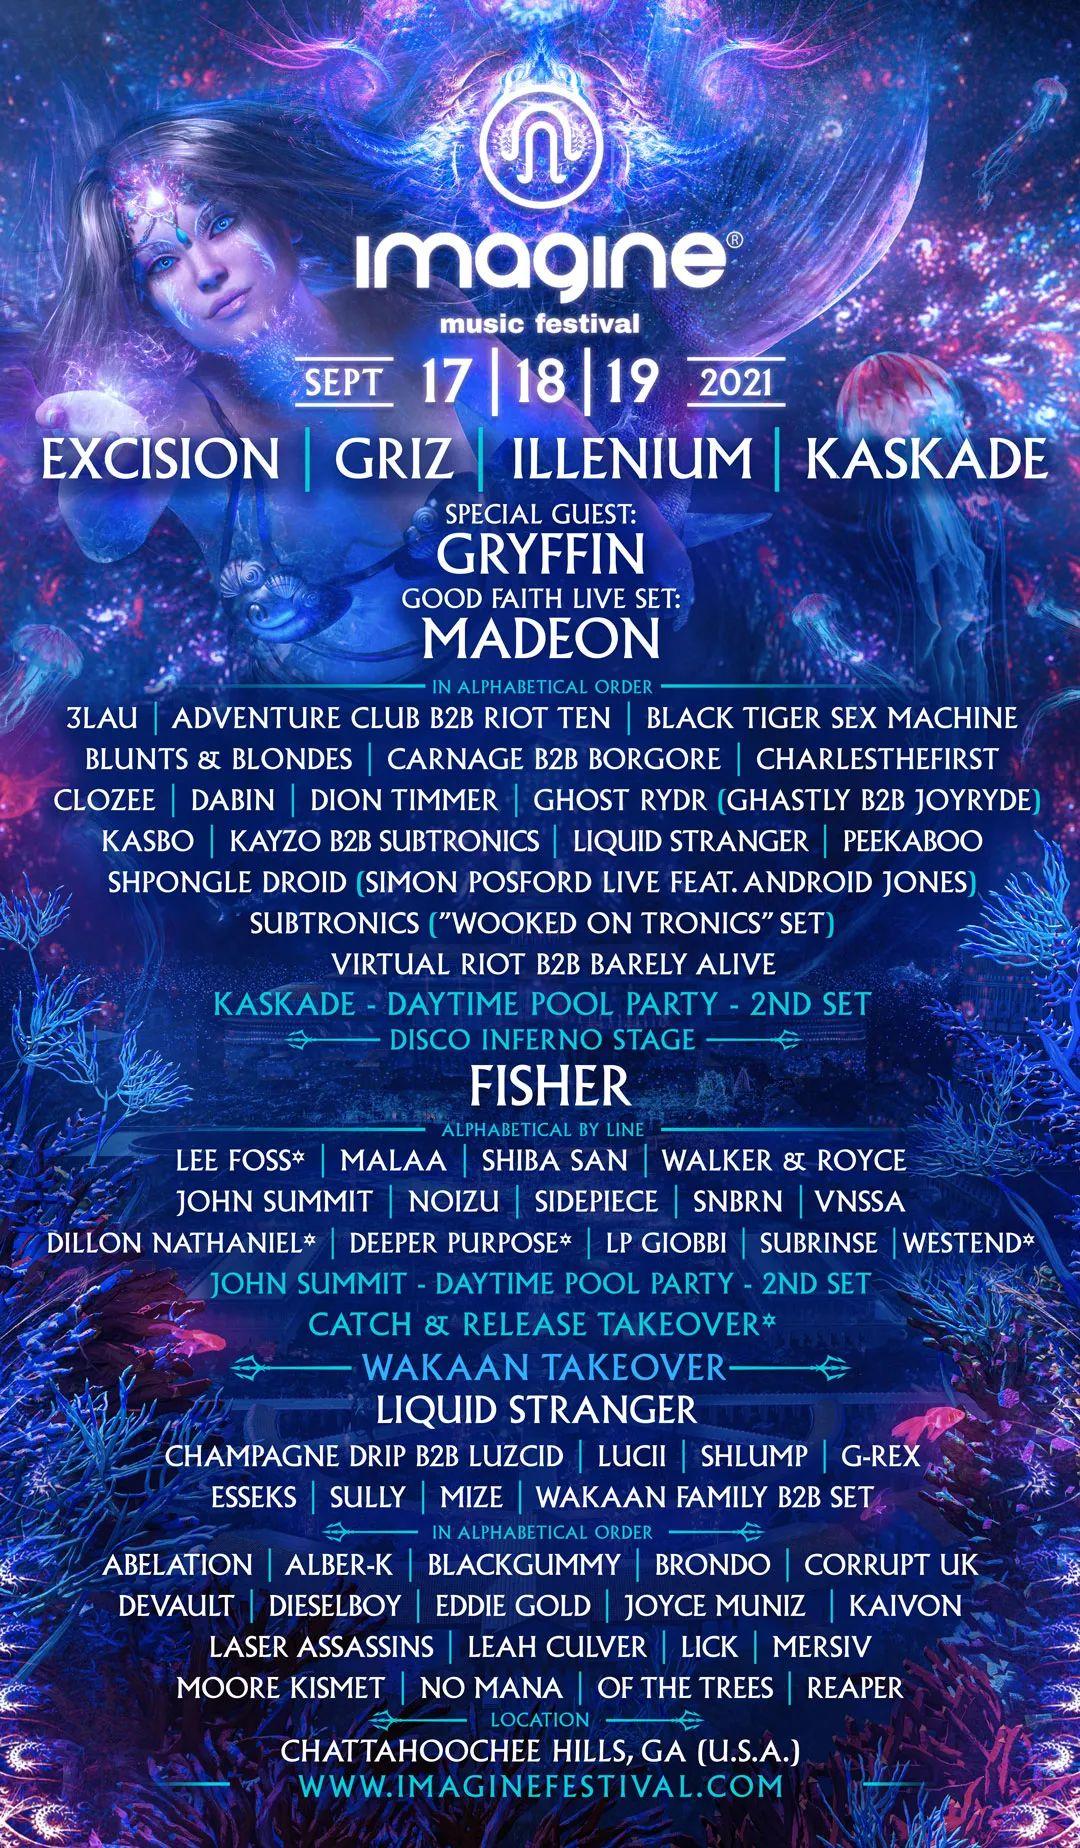 Imagine music festival 2021 lineup poster